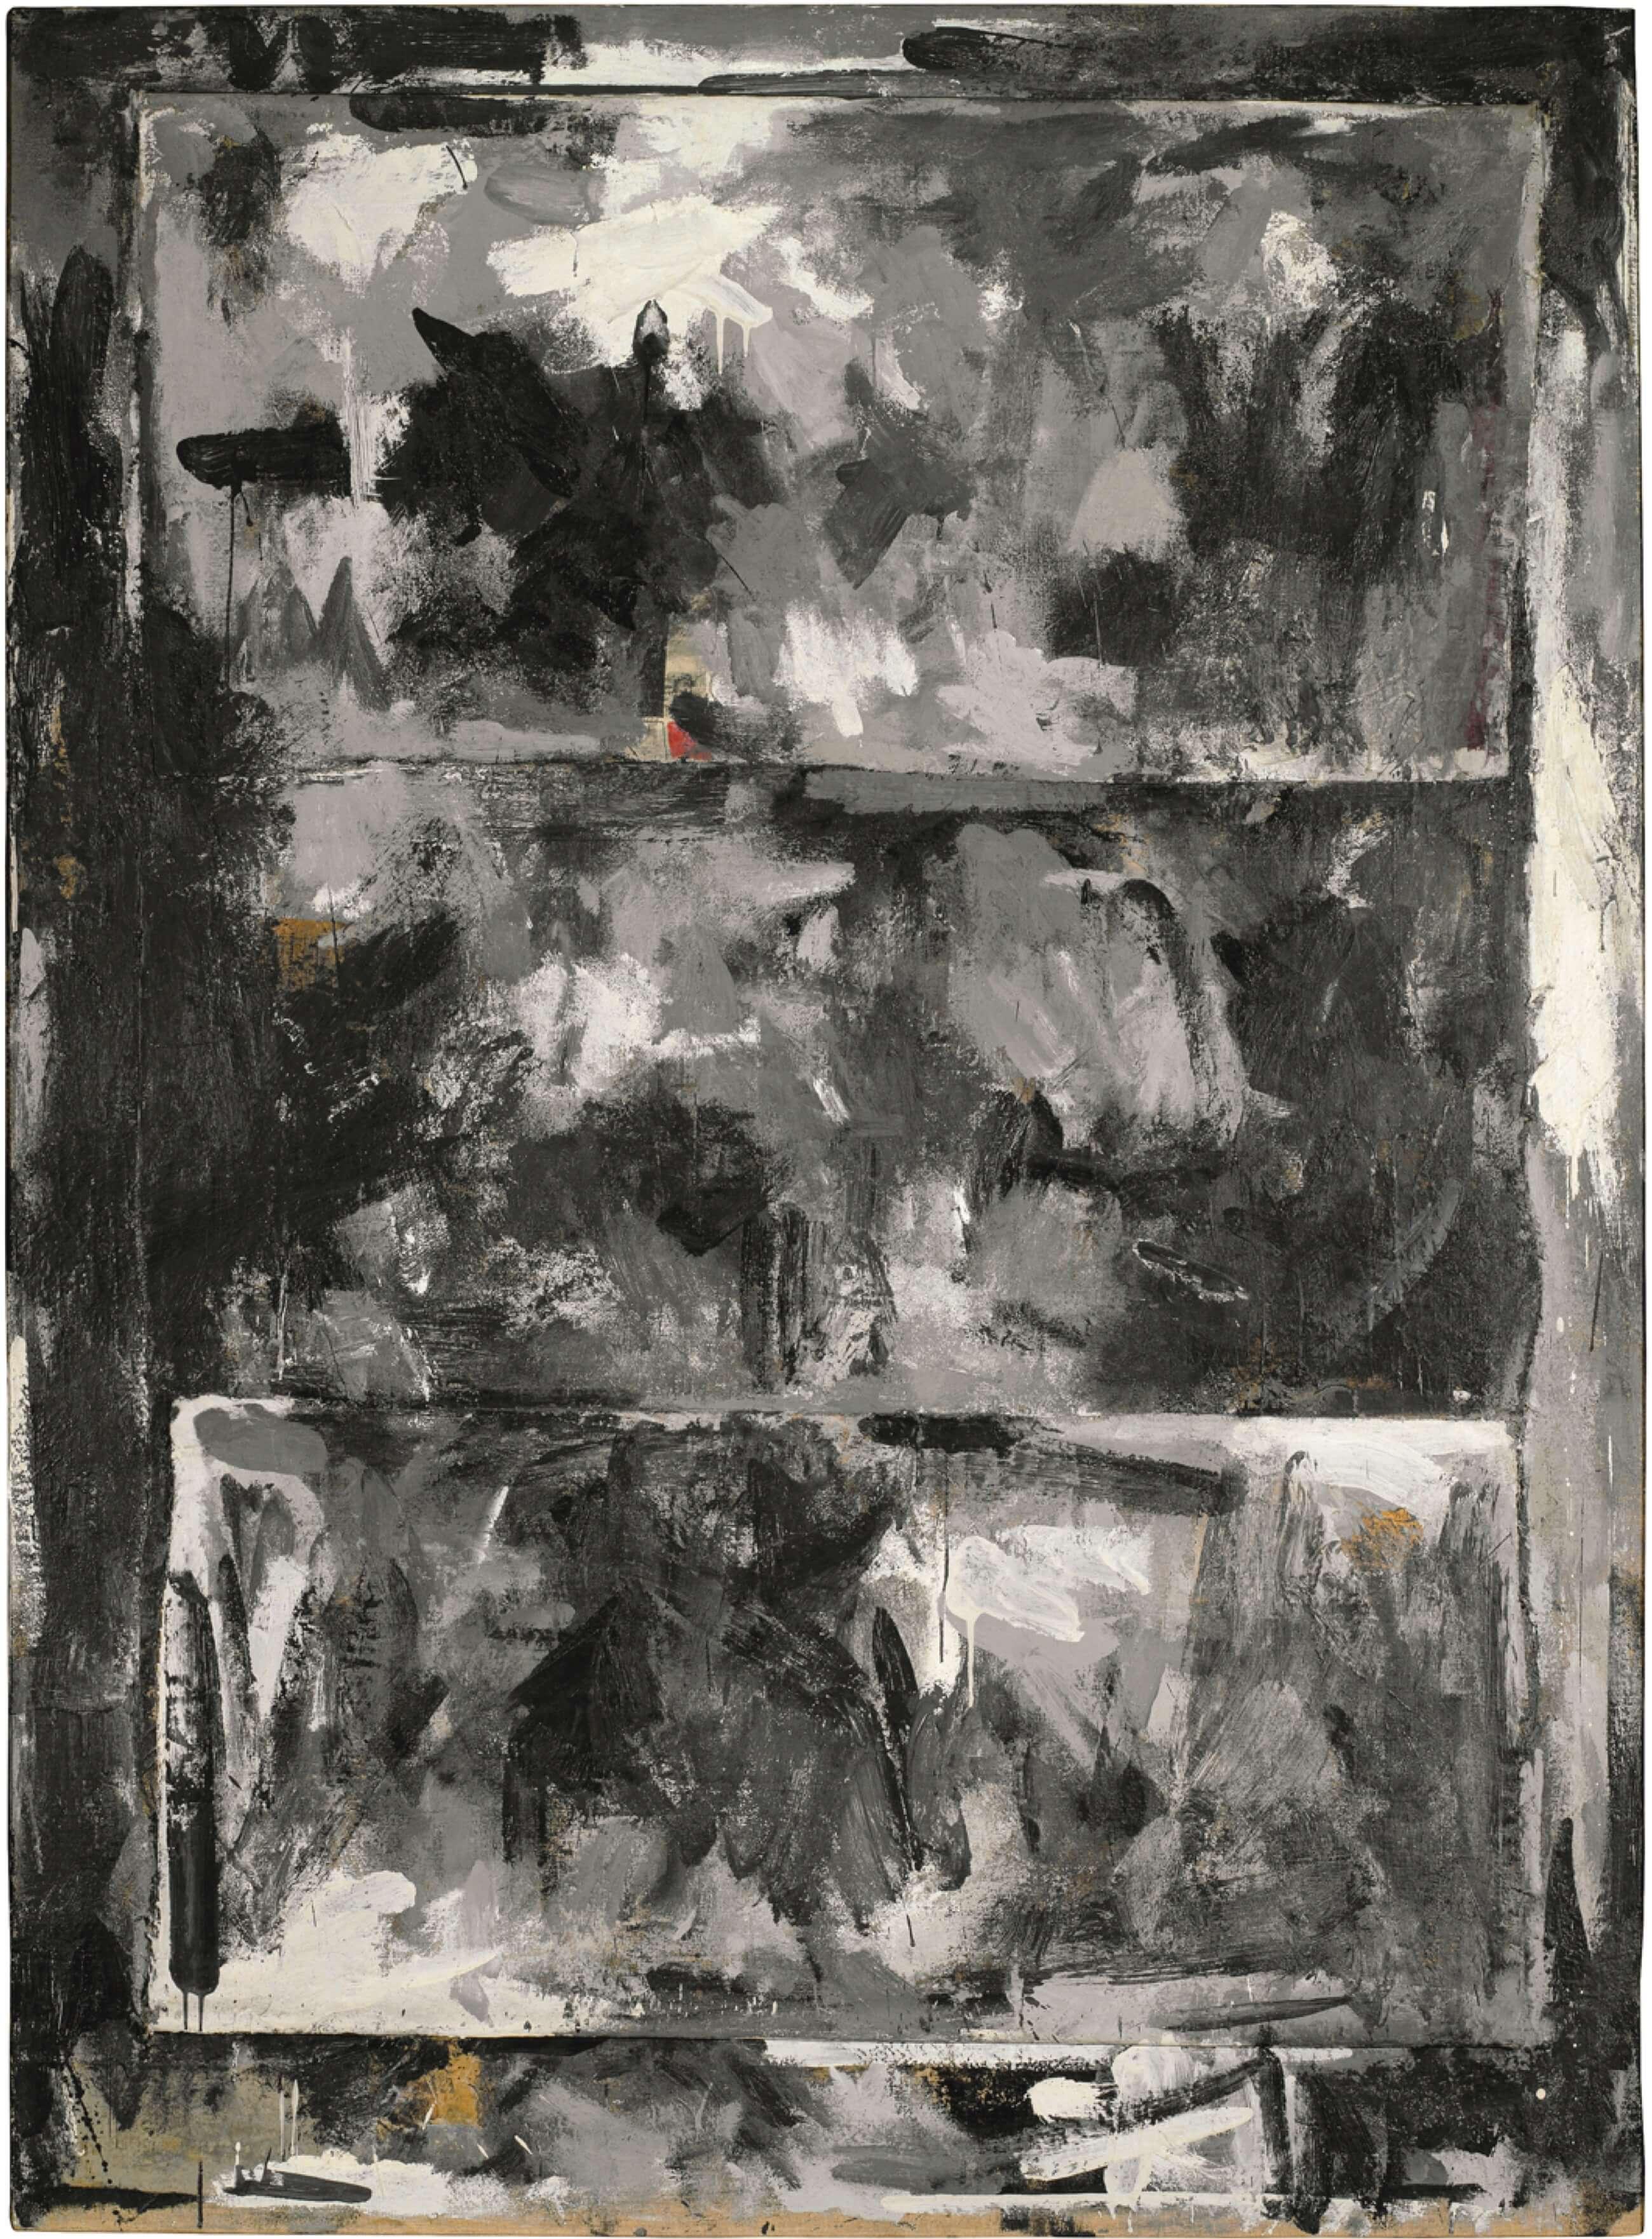 Reconstruction, 1959, by Jasper Johns